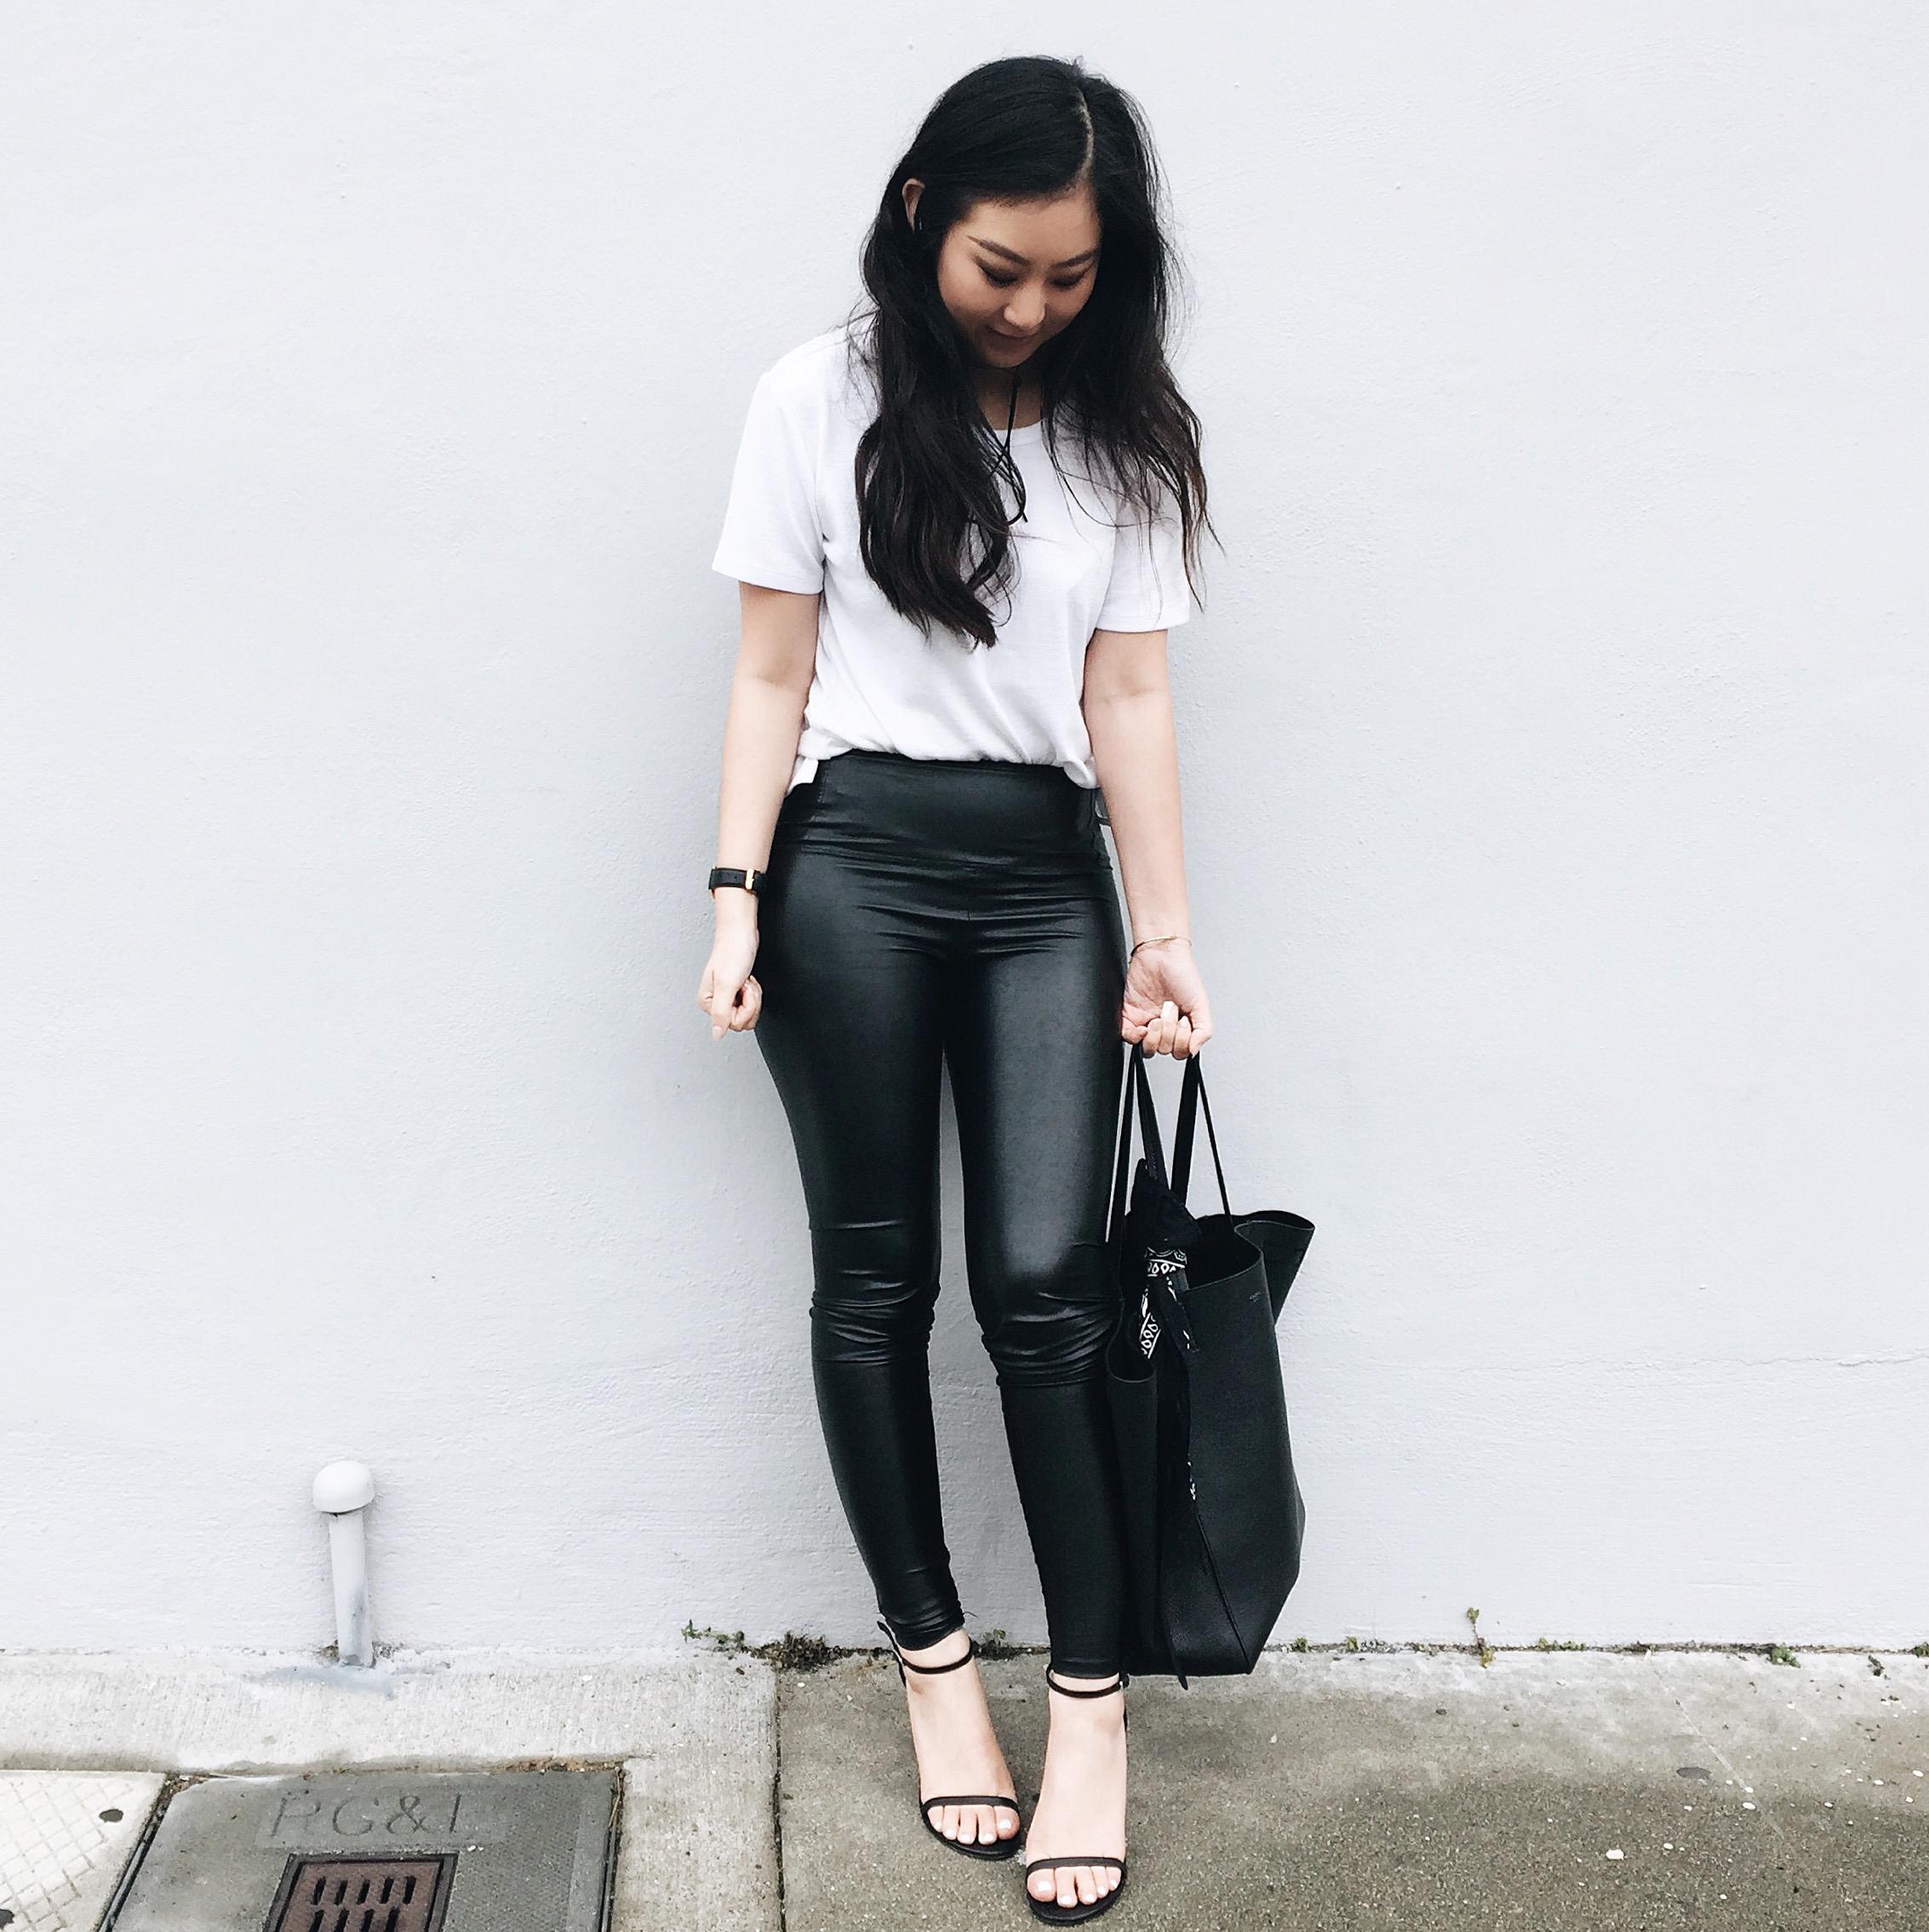 ARITZIA   white tee   / ARITZIA   leather leggings   / STUART WEITZMAN   Nudistsong heels   / CELINE  Phantom tote  / ZARA  trench coat /  NOMADICSTORE   wrap choker (via Etsy)